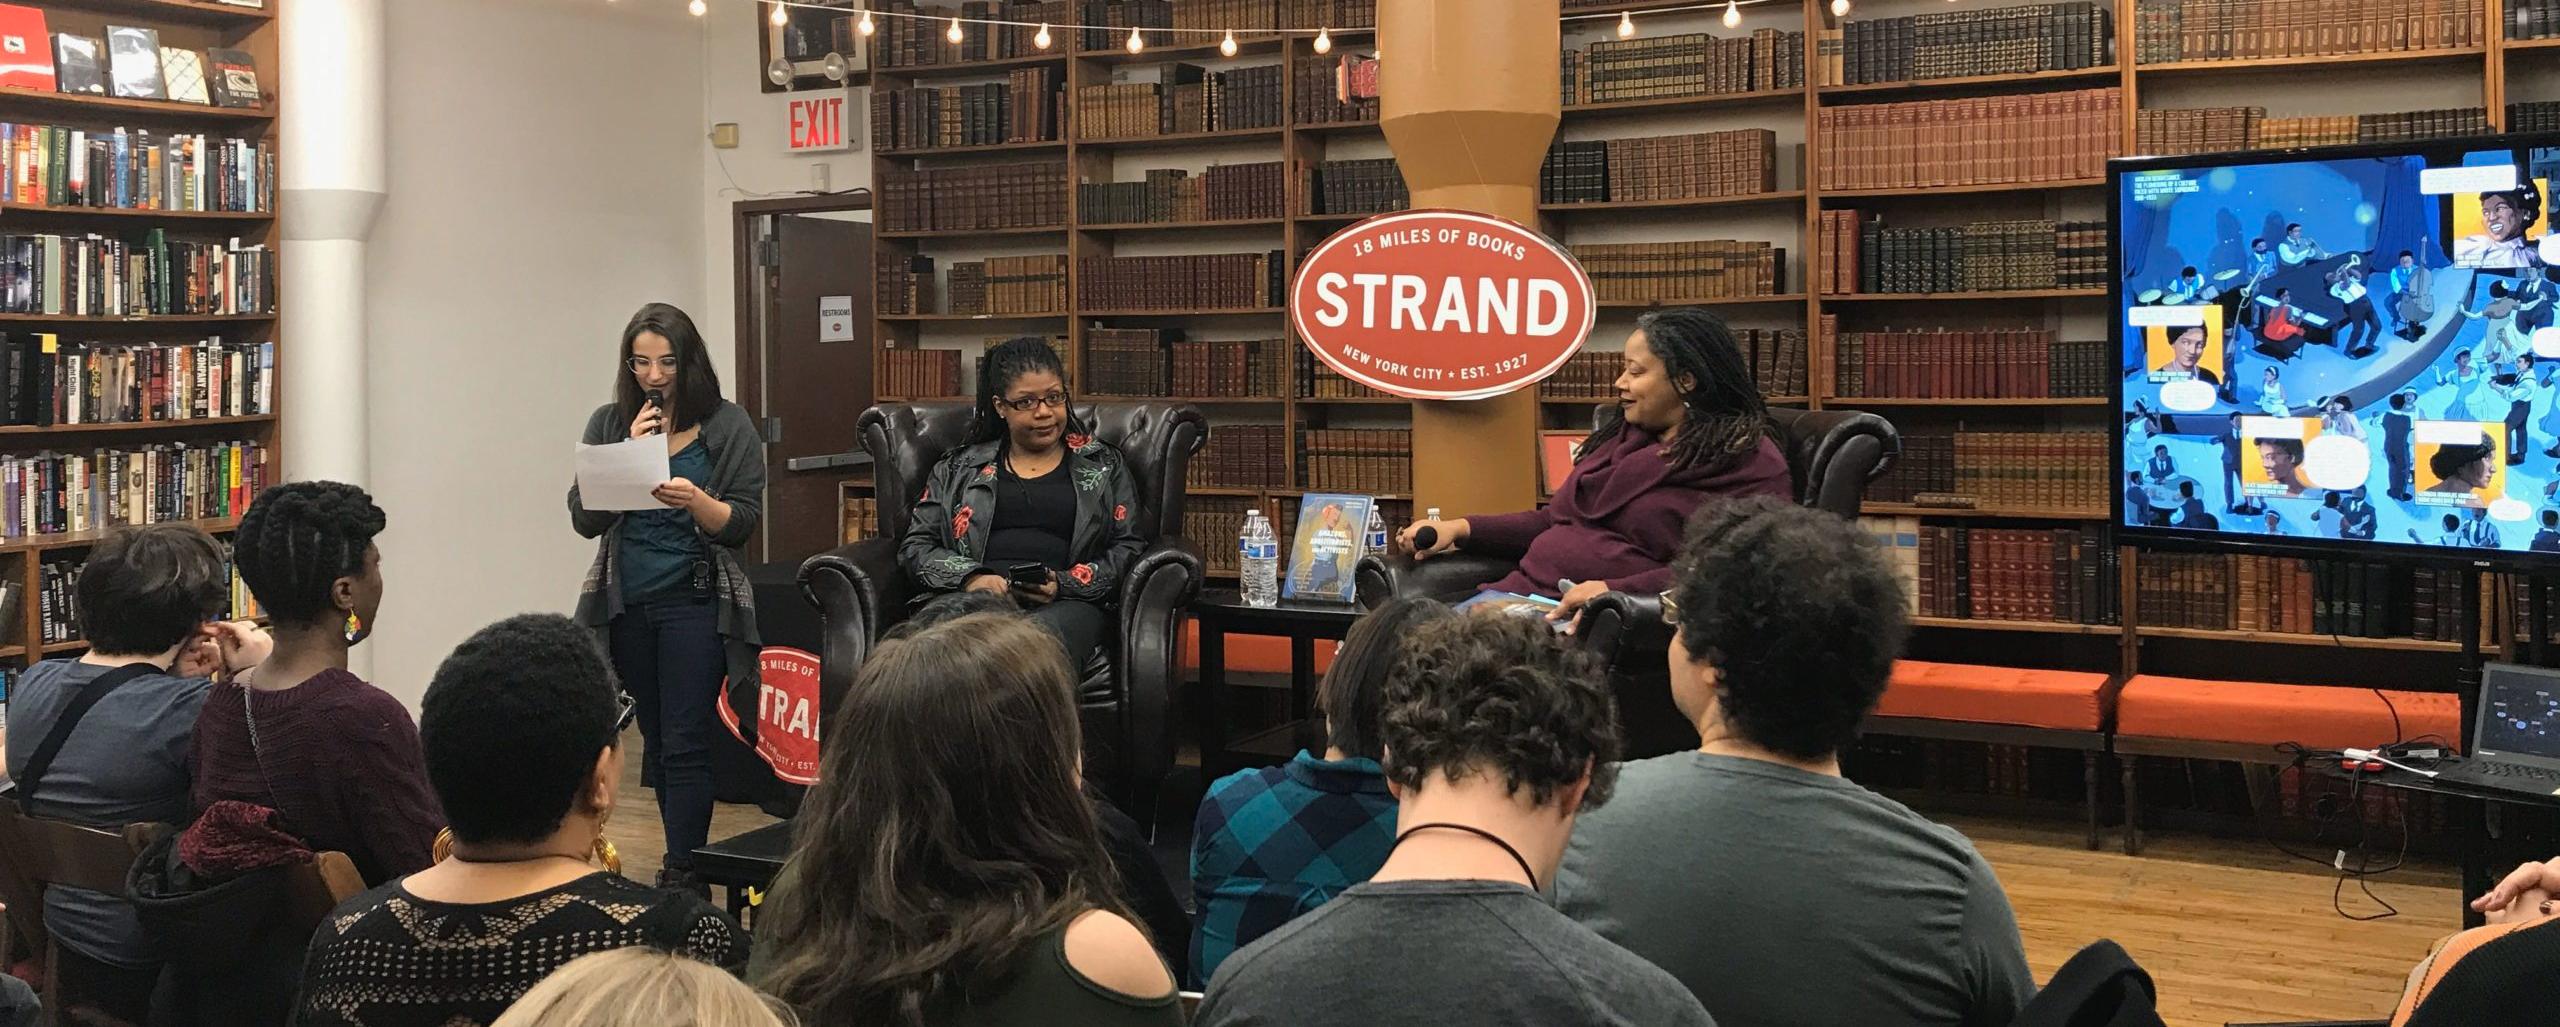 Mikki Kendall and N.K. Jemisin at Strand Book Store